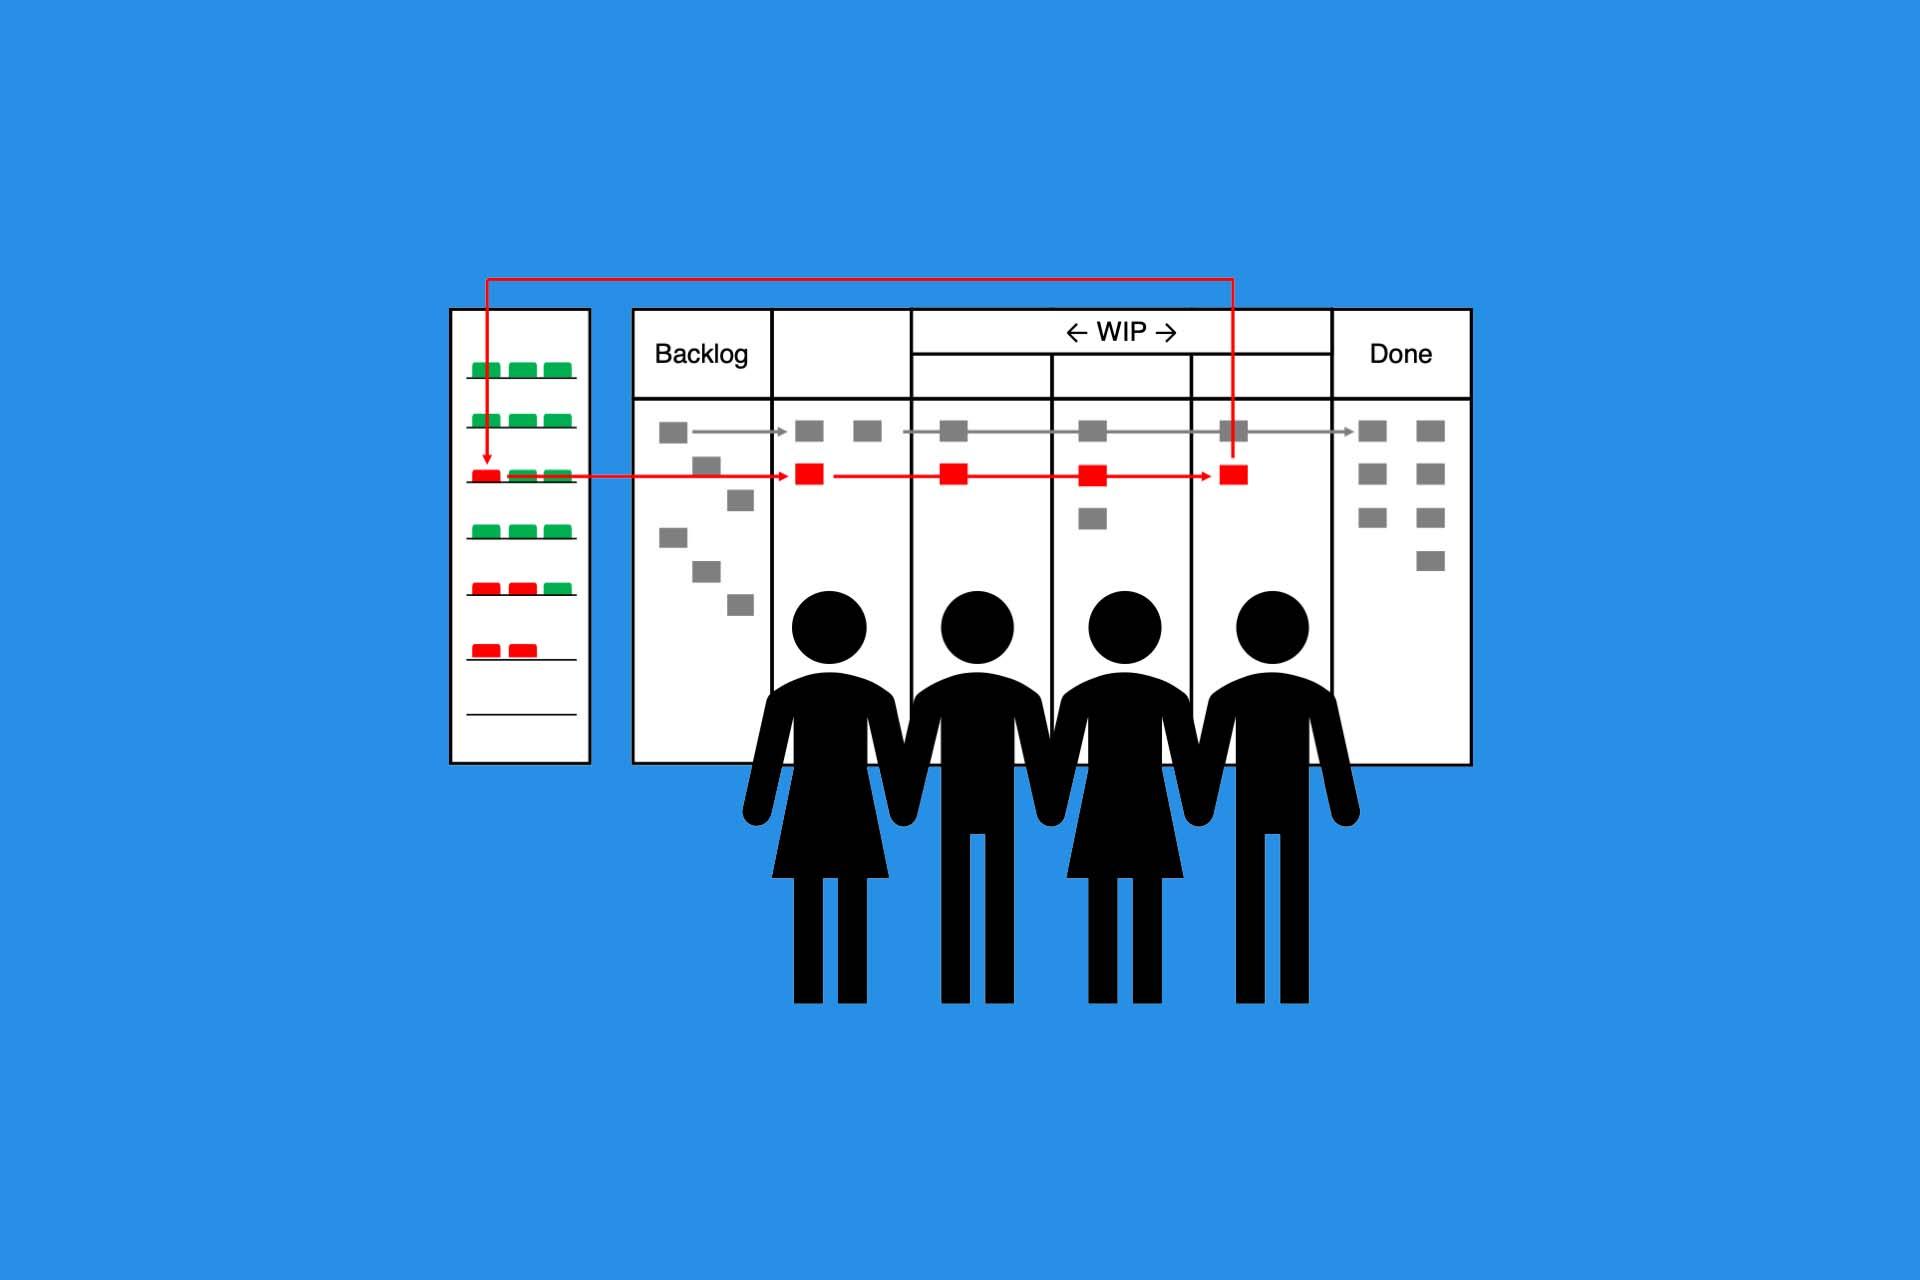 Kamishibai und Kanban für [zu] interdisziplinäre Teams - Blog - t2informatik